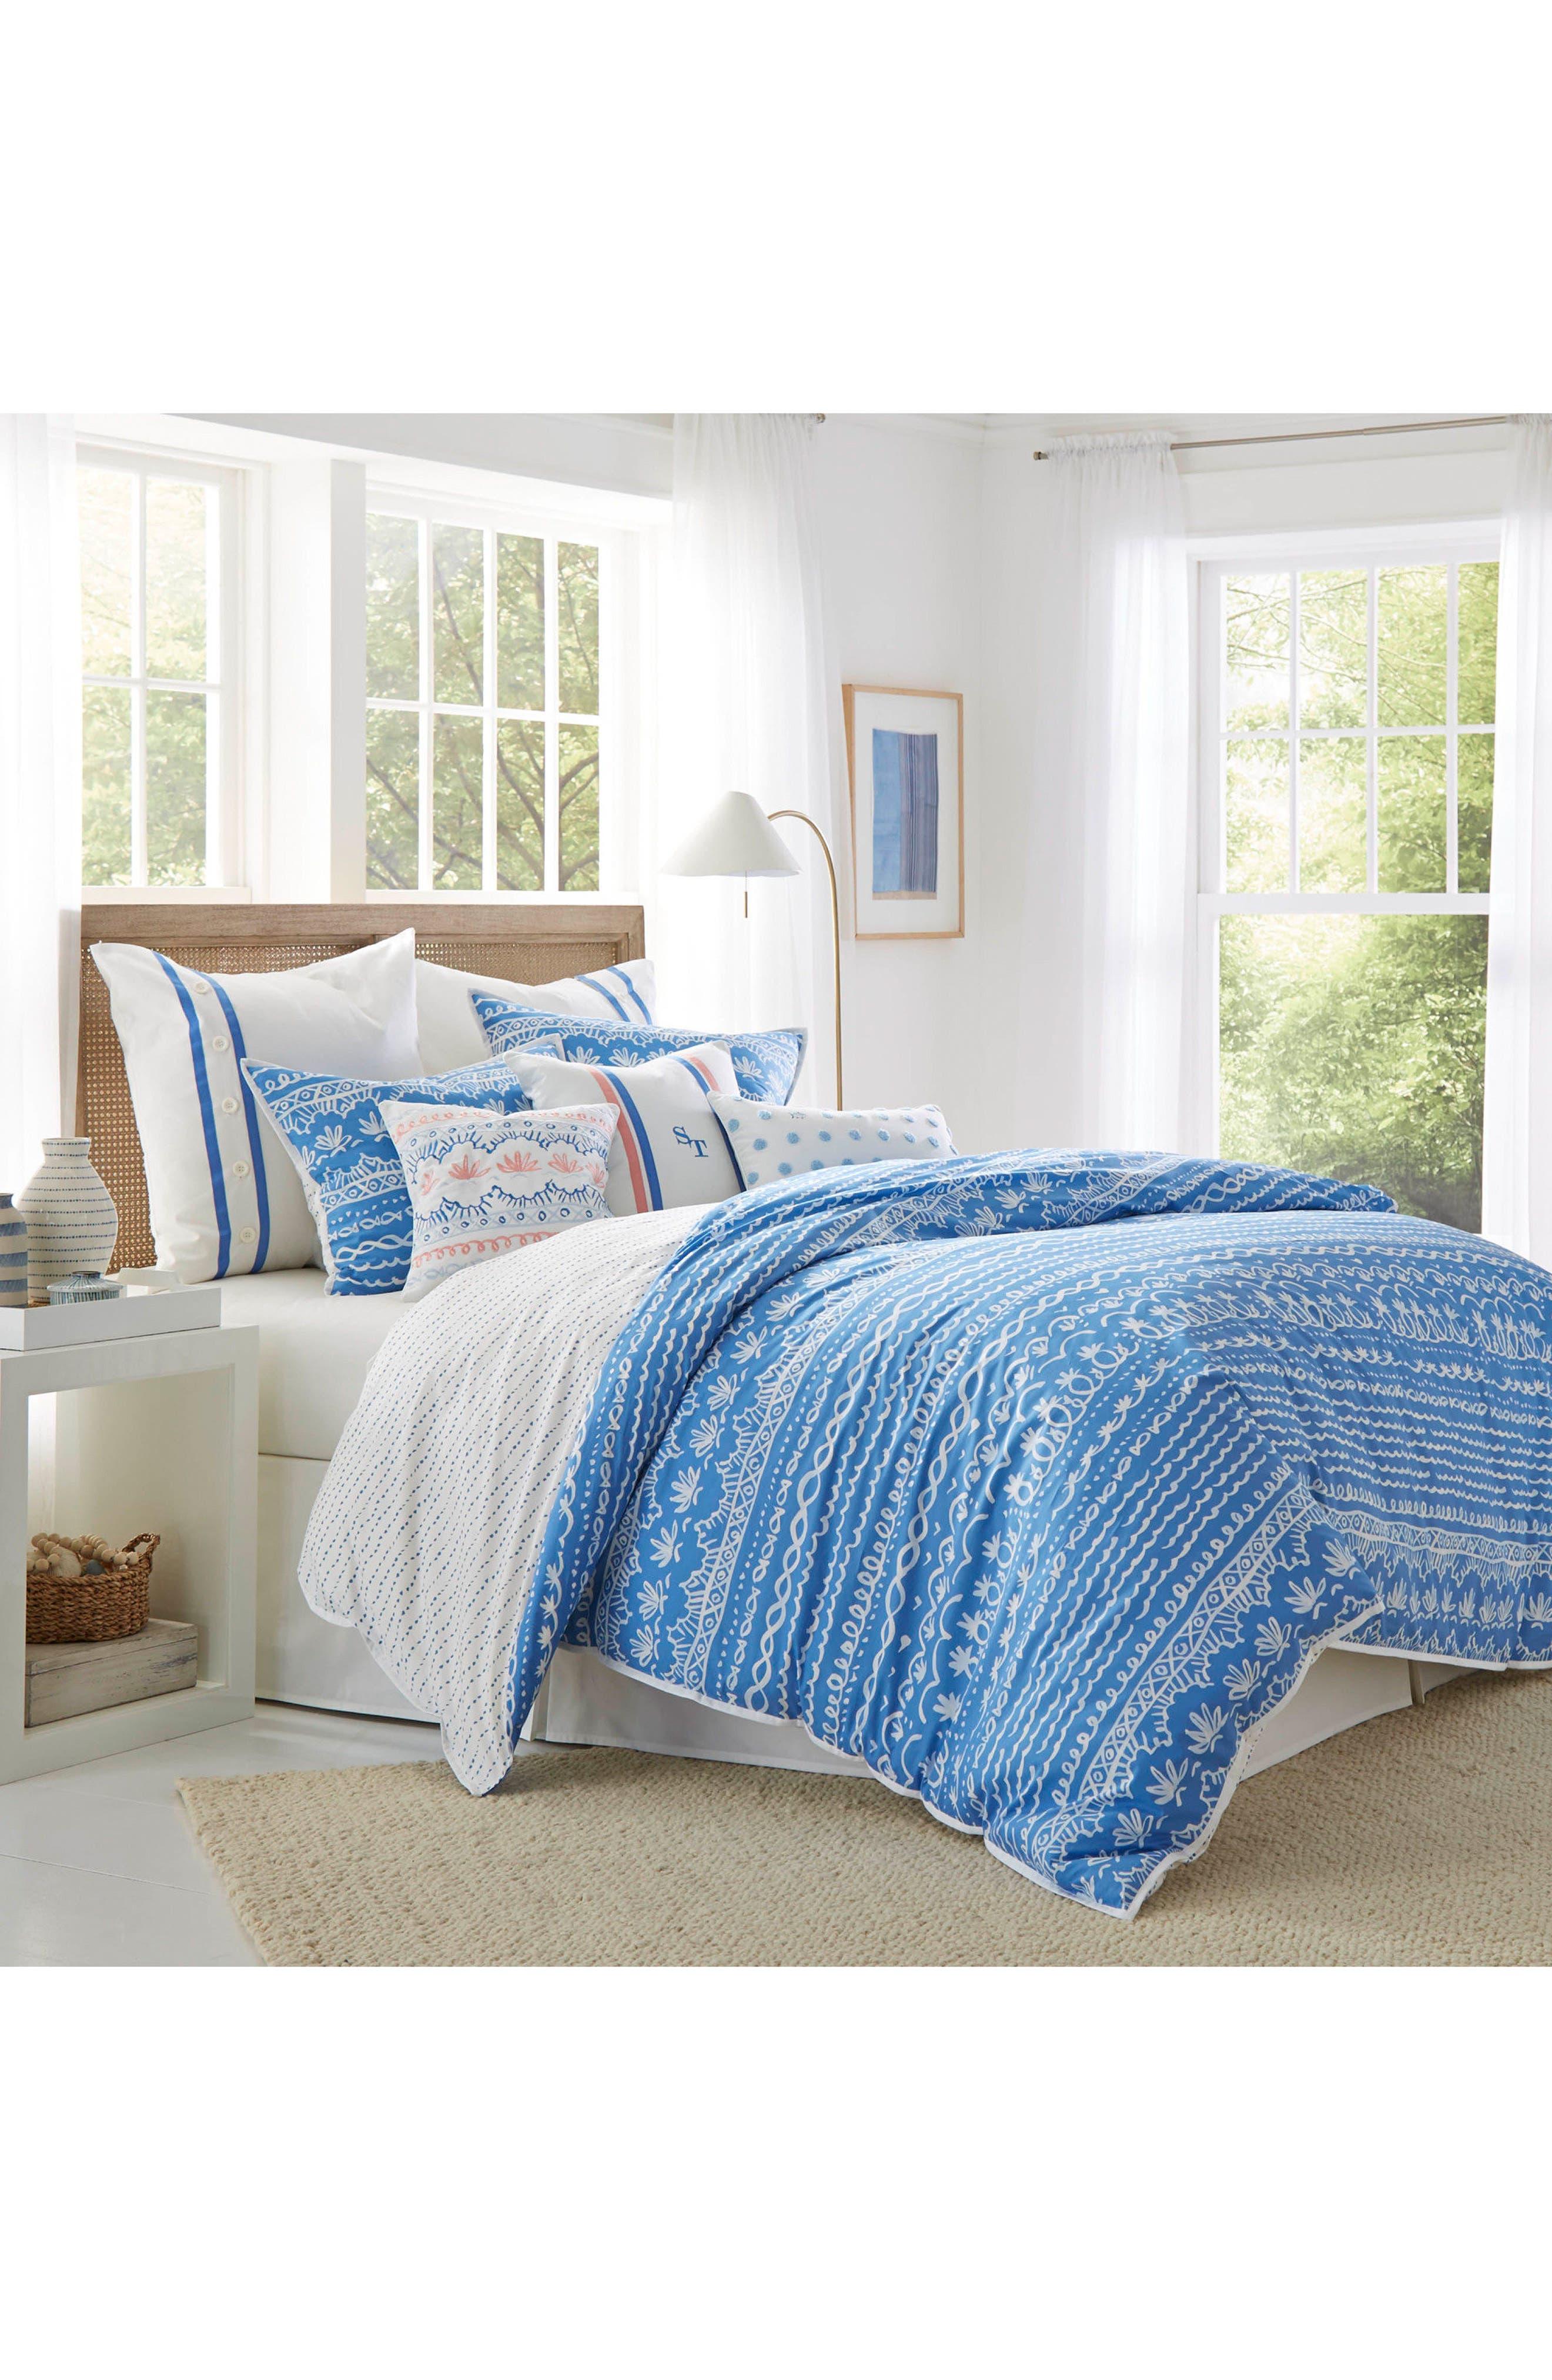 Summer Daze Comforter Set,                             Main thumbnail 1, color,                             Blue